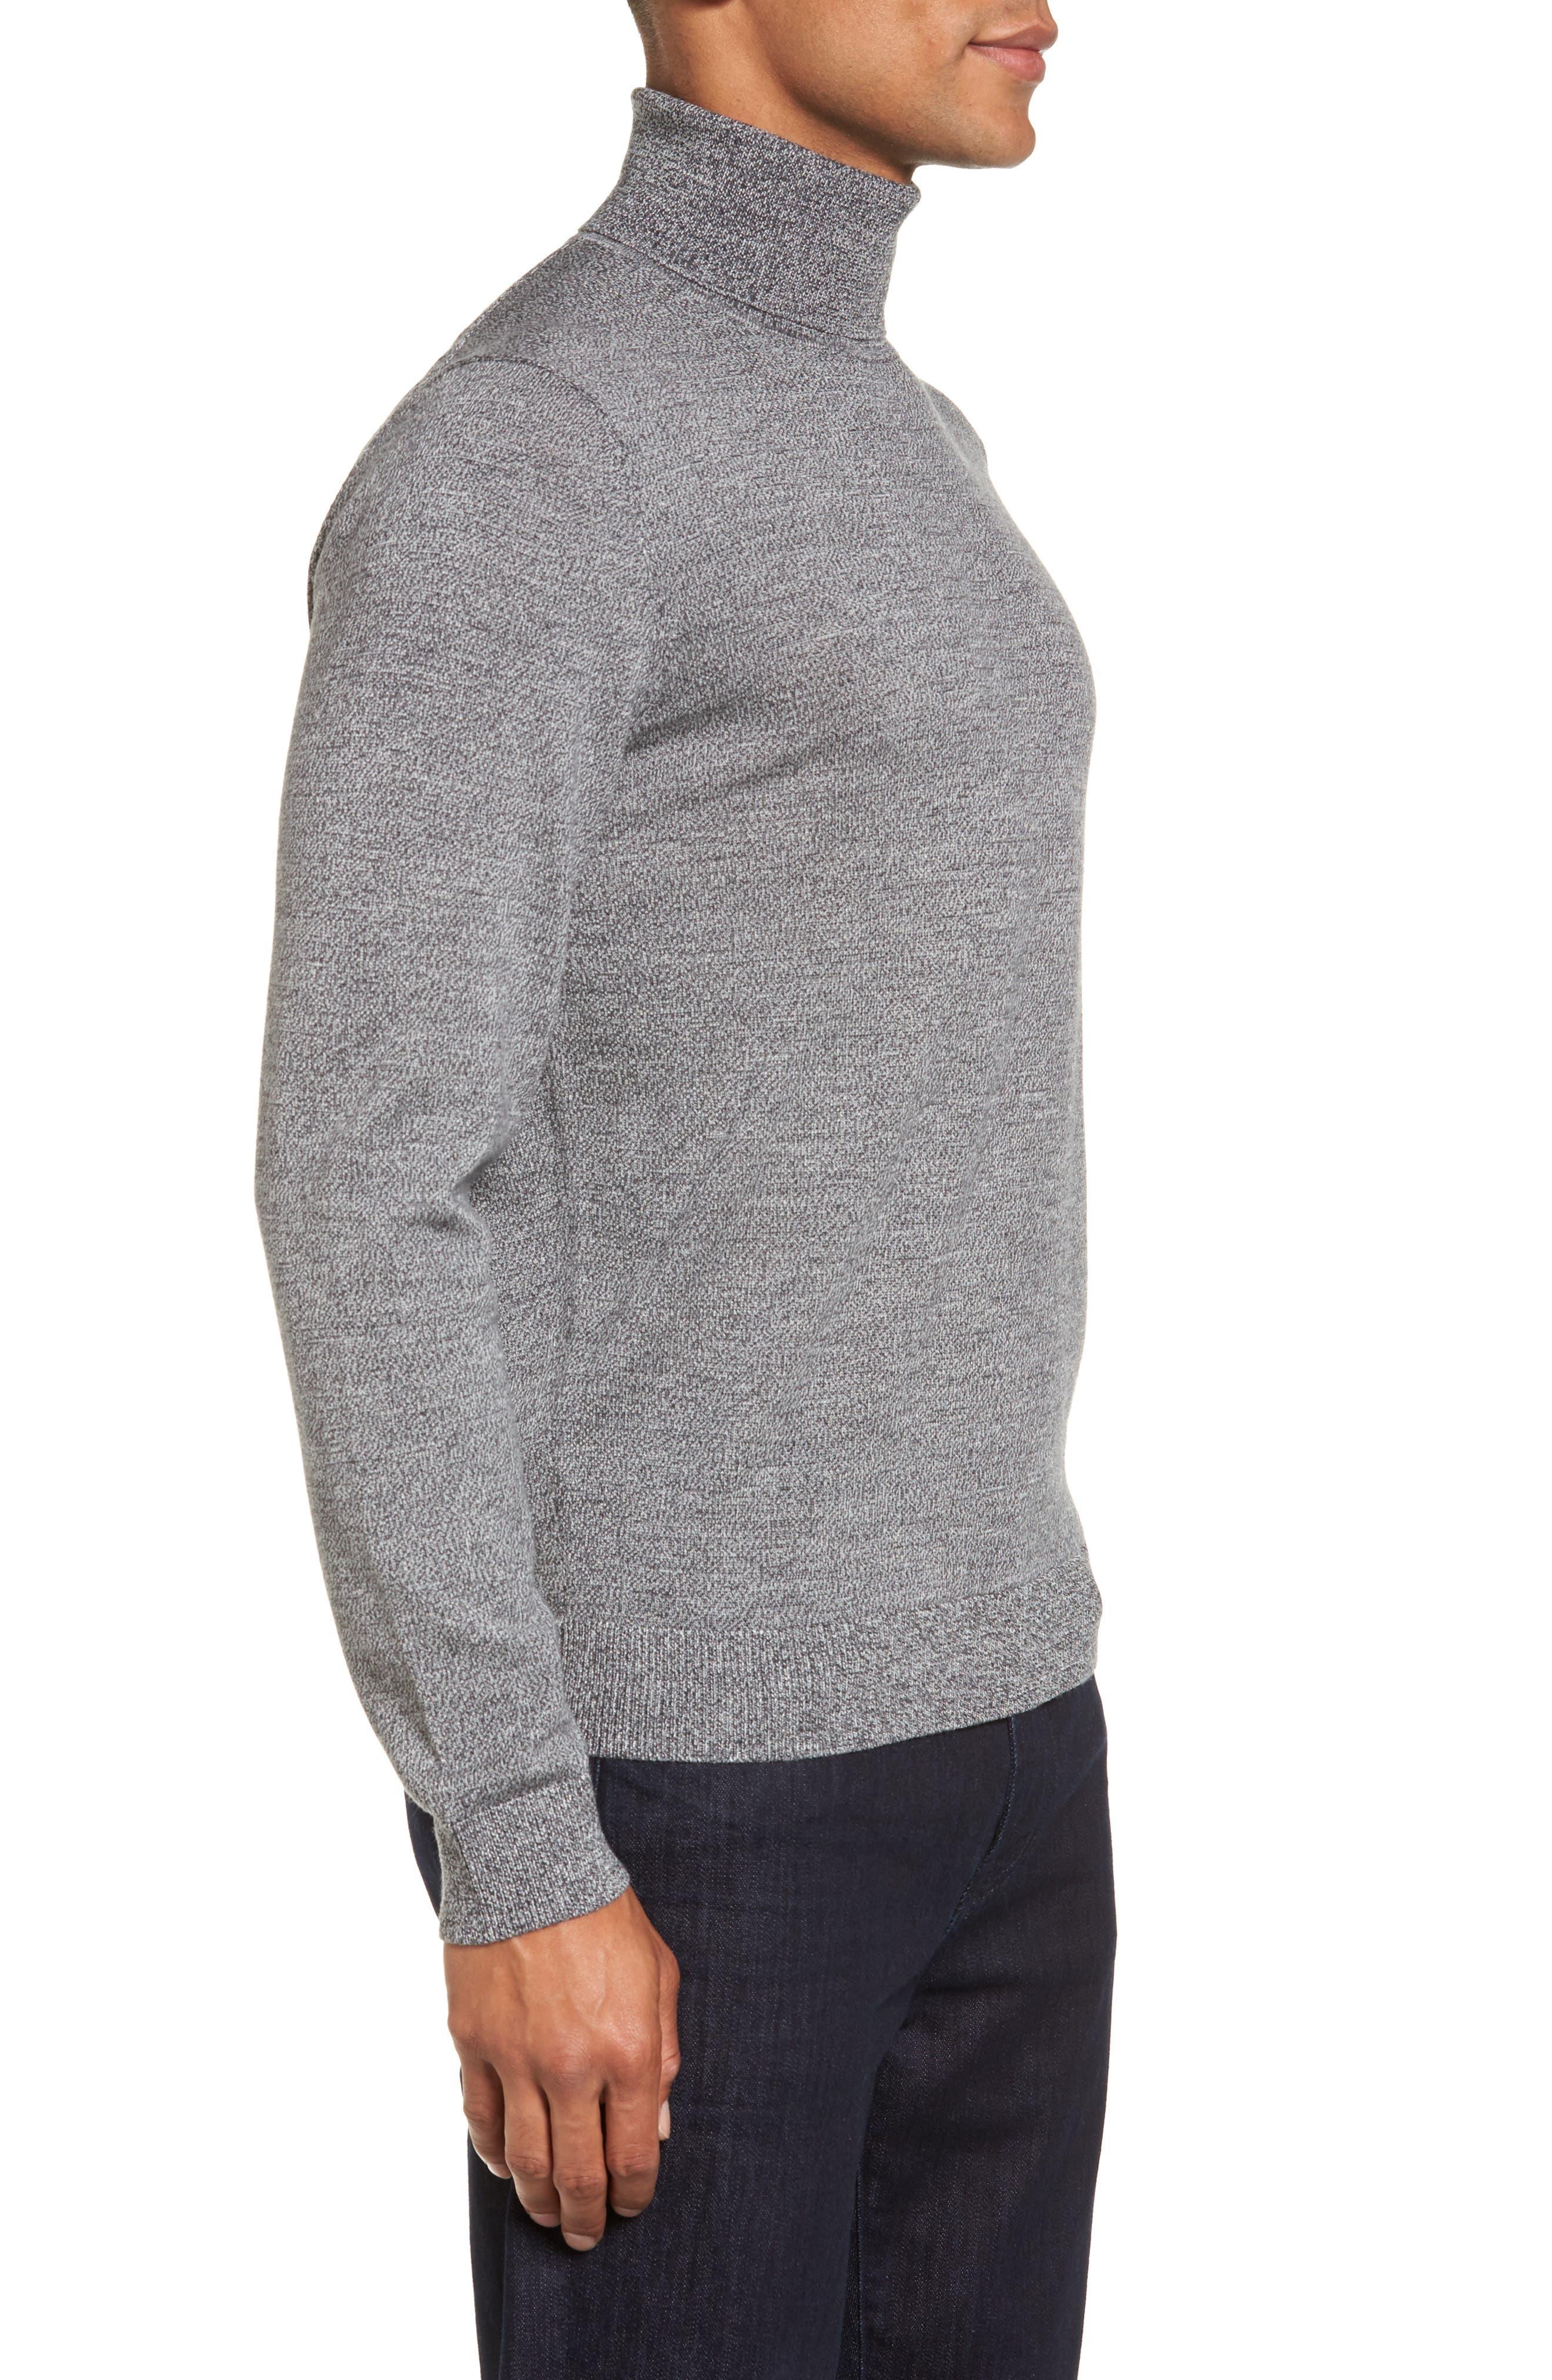 Merino Wool Turtleneck Sweater,                             Alternate thumbnail 3, color,                             Grey Shade Marl